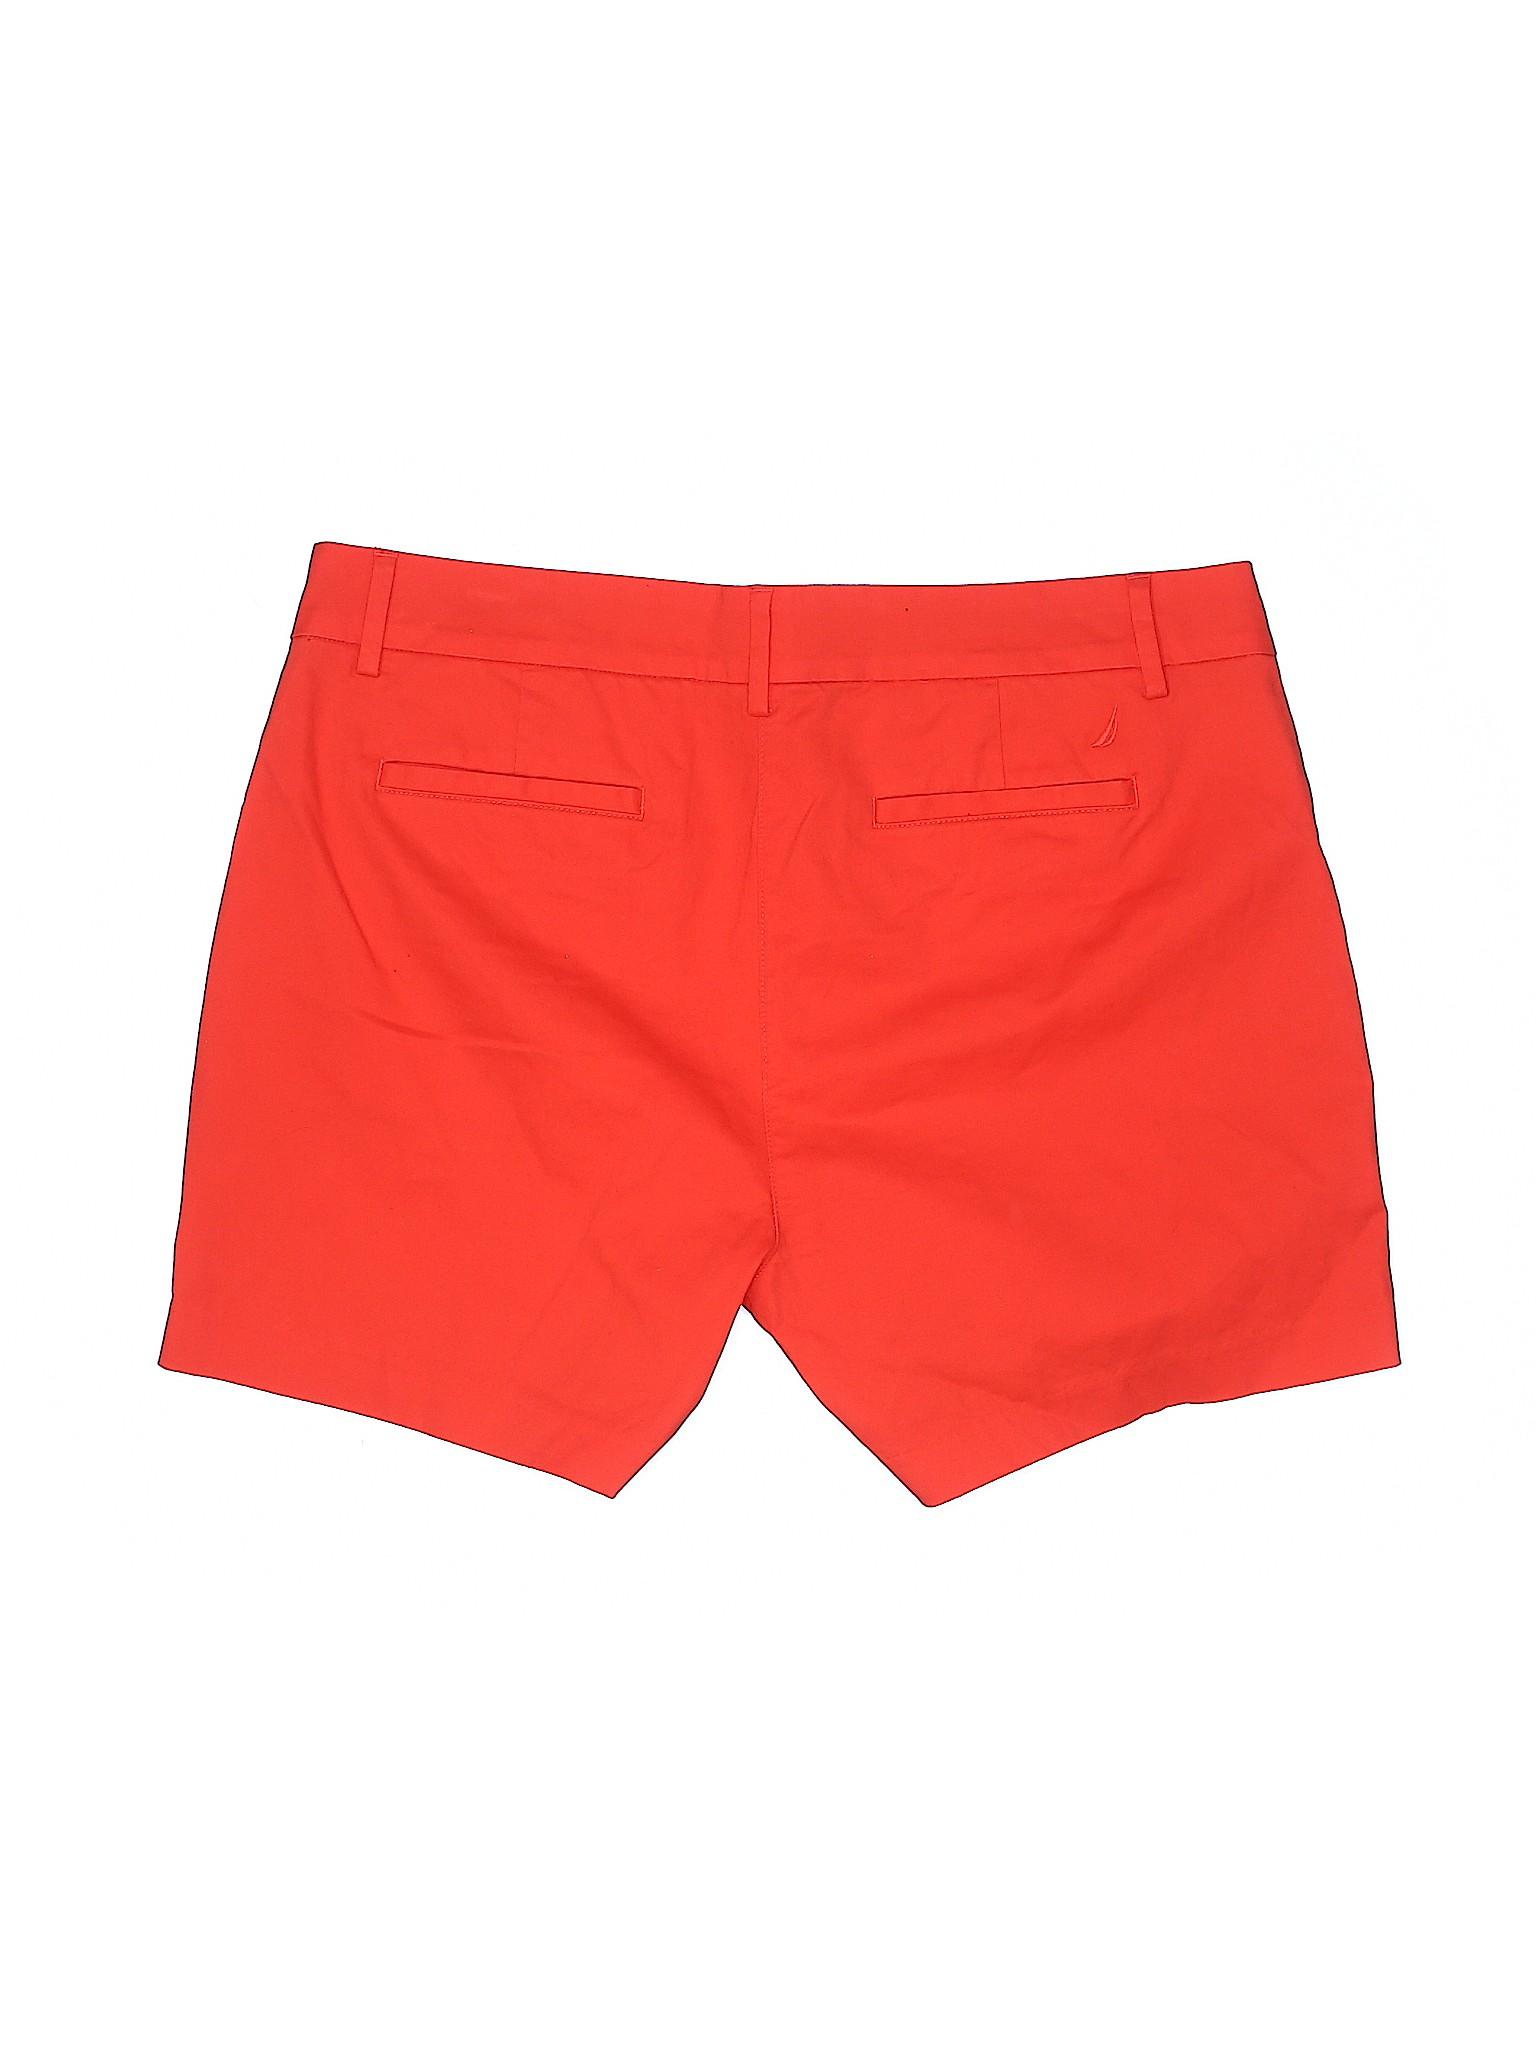 Khaki Boutique winter winter Shorts Boutique Nautica 8waI6q1